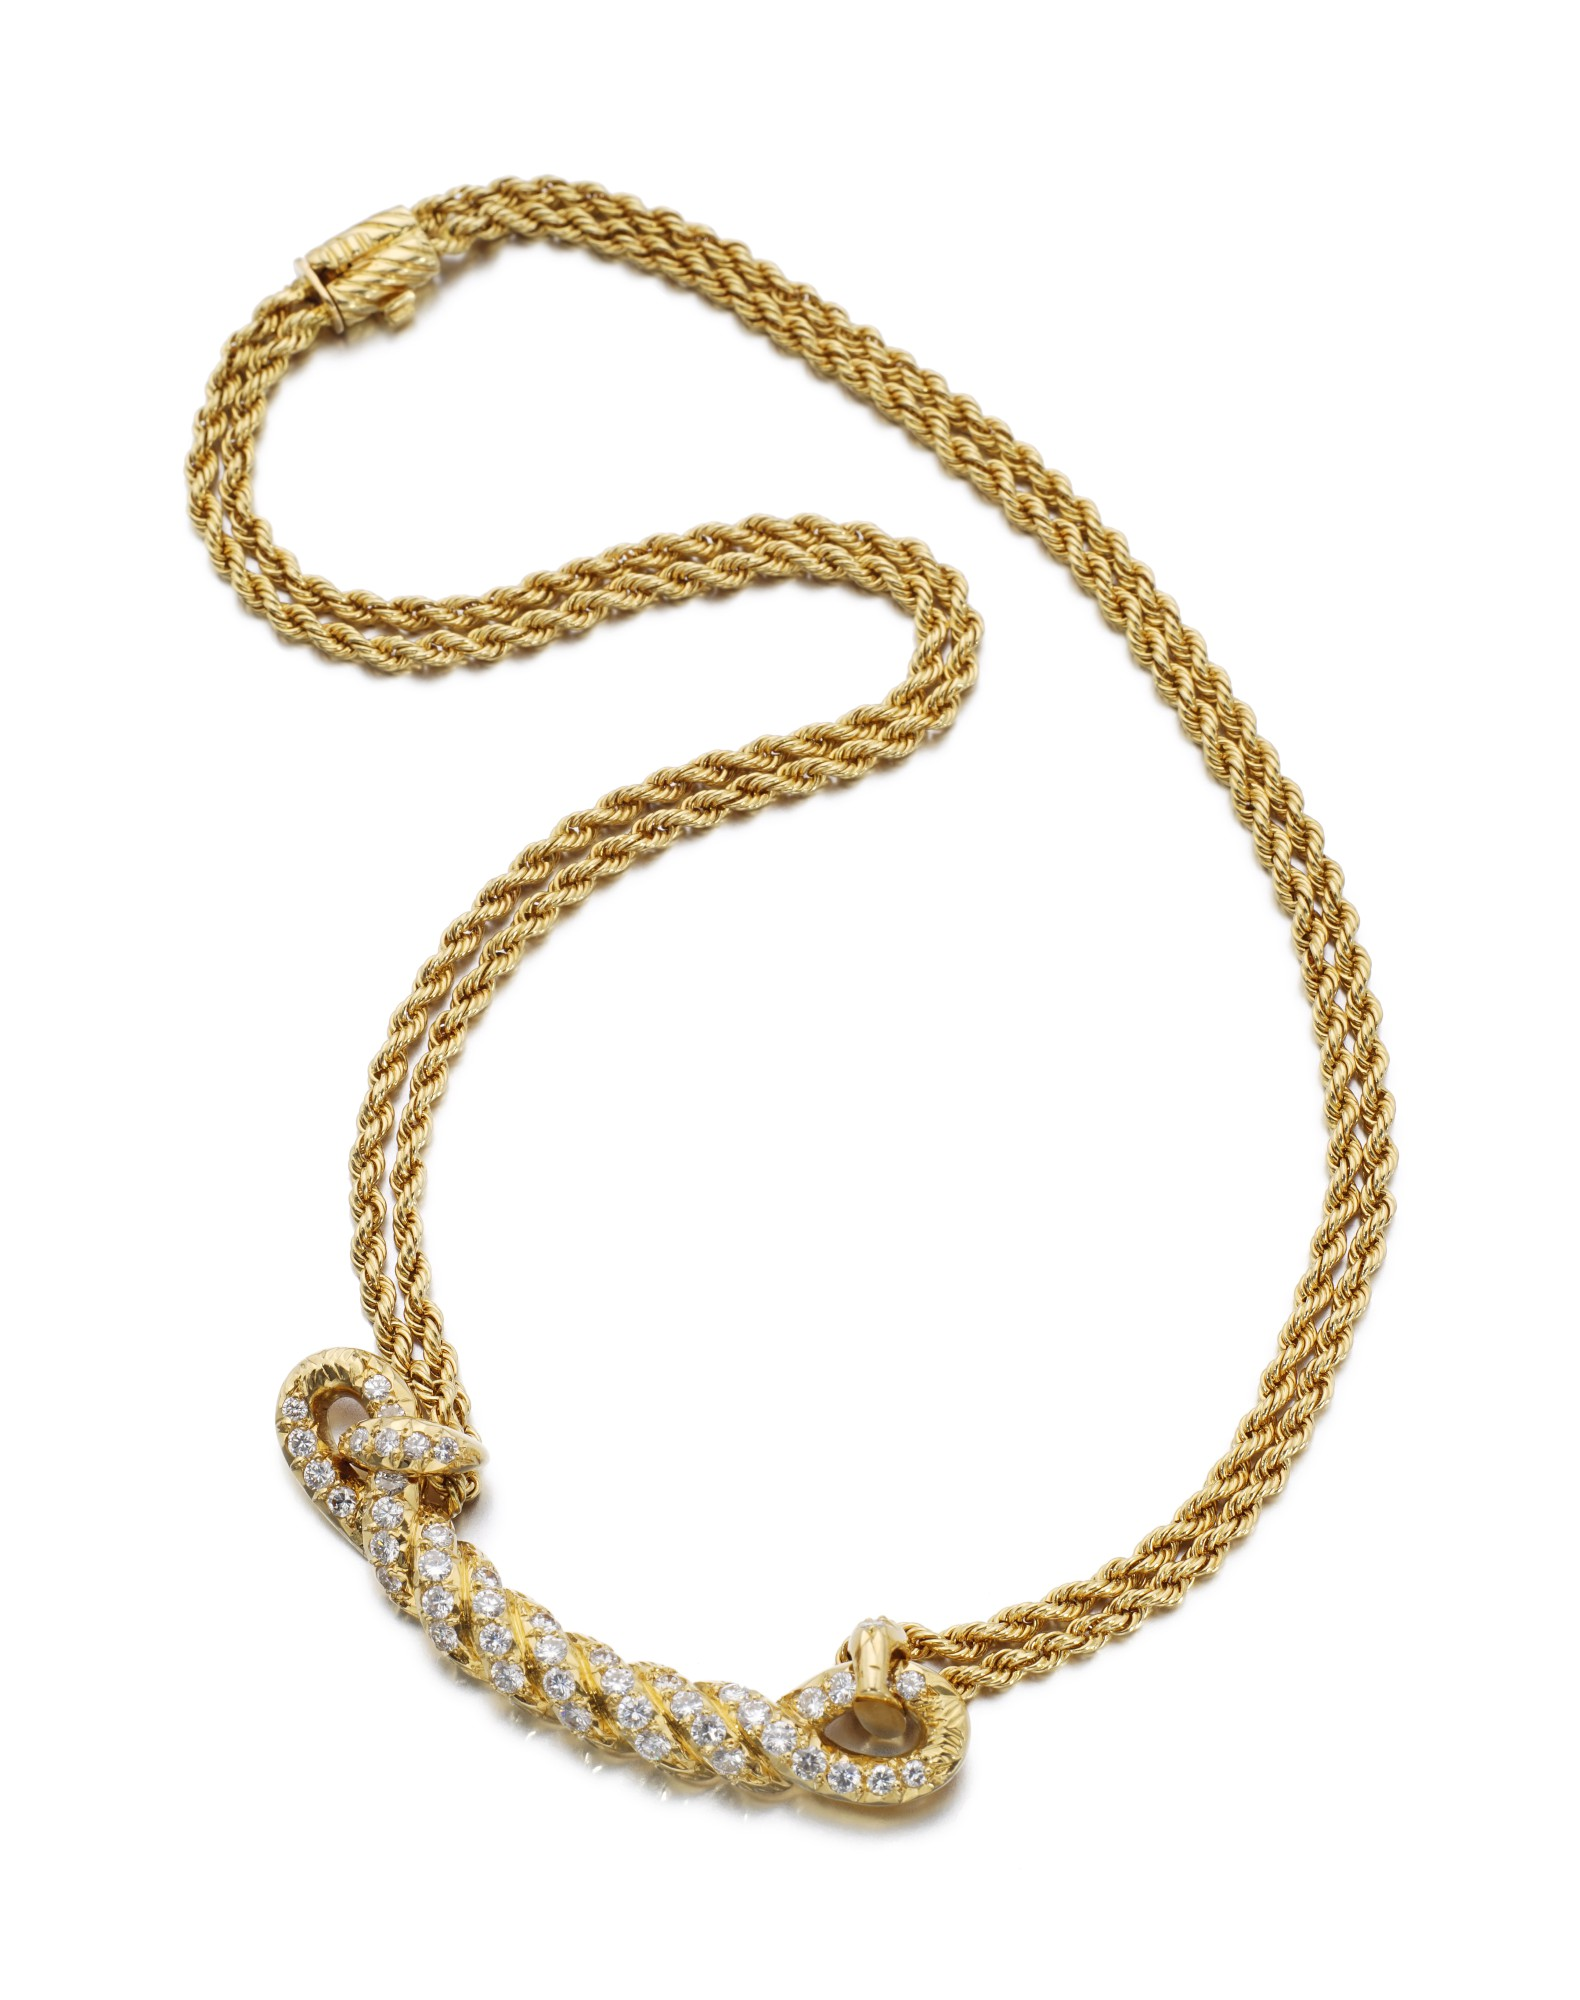 GOLD AND DIAMOND NECKLACE | VAN CLEEF & ARPELS